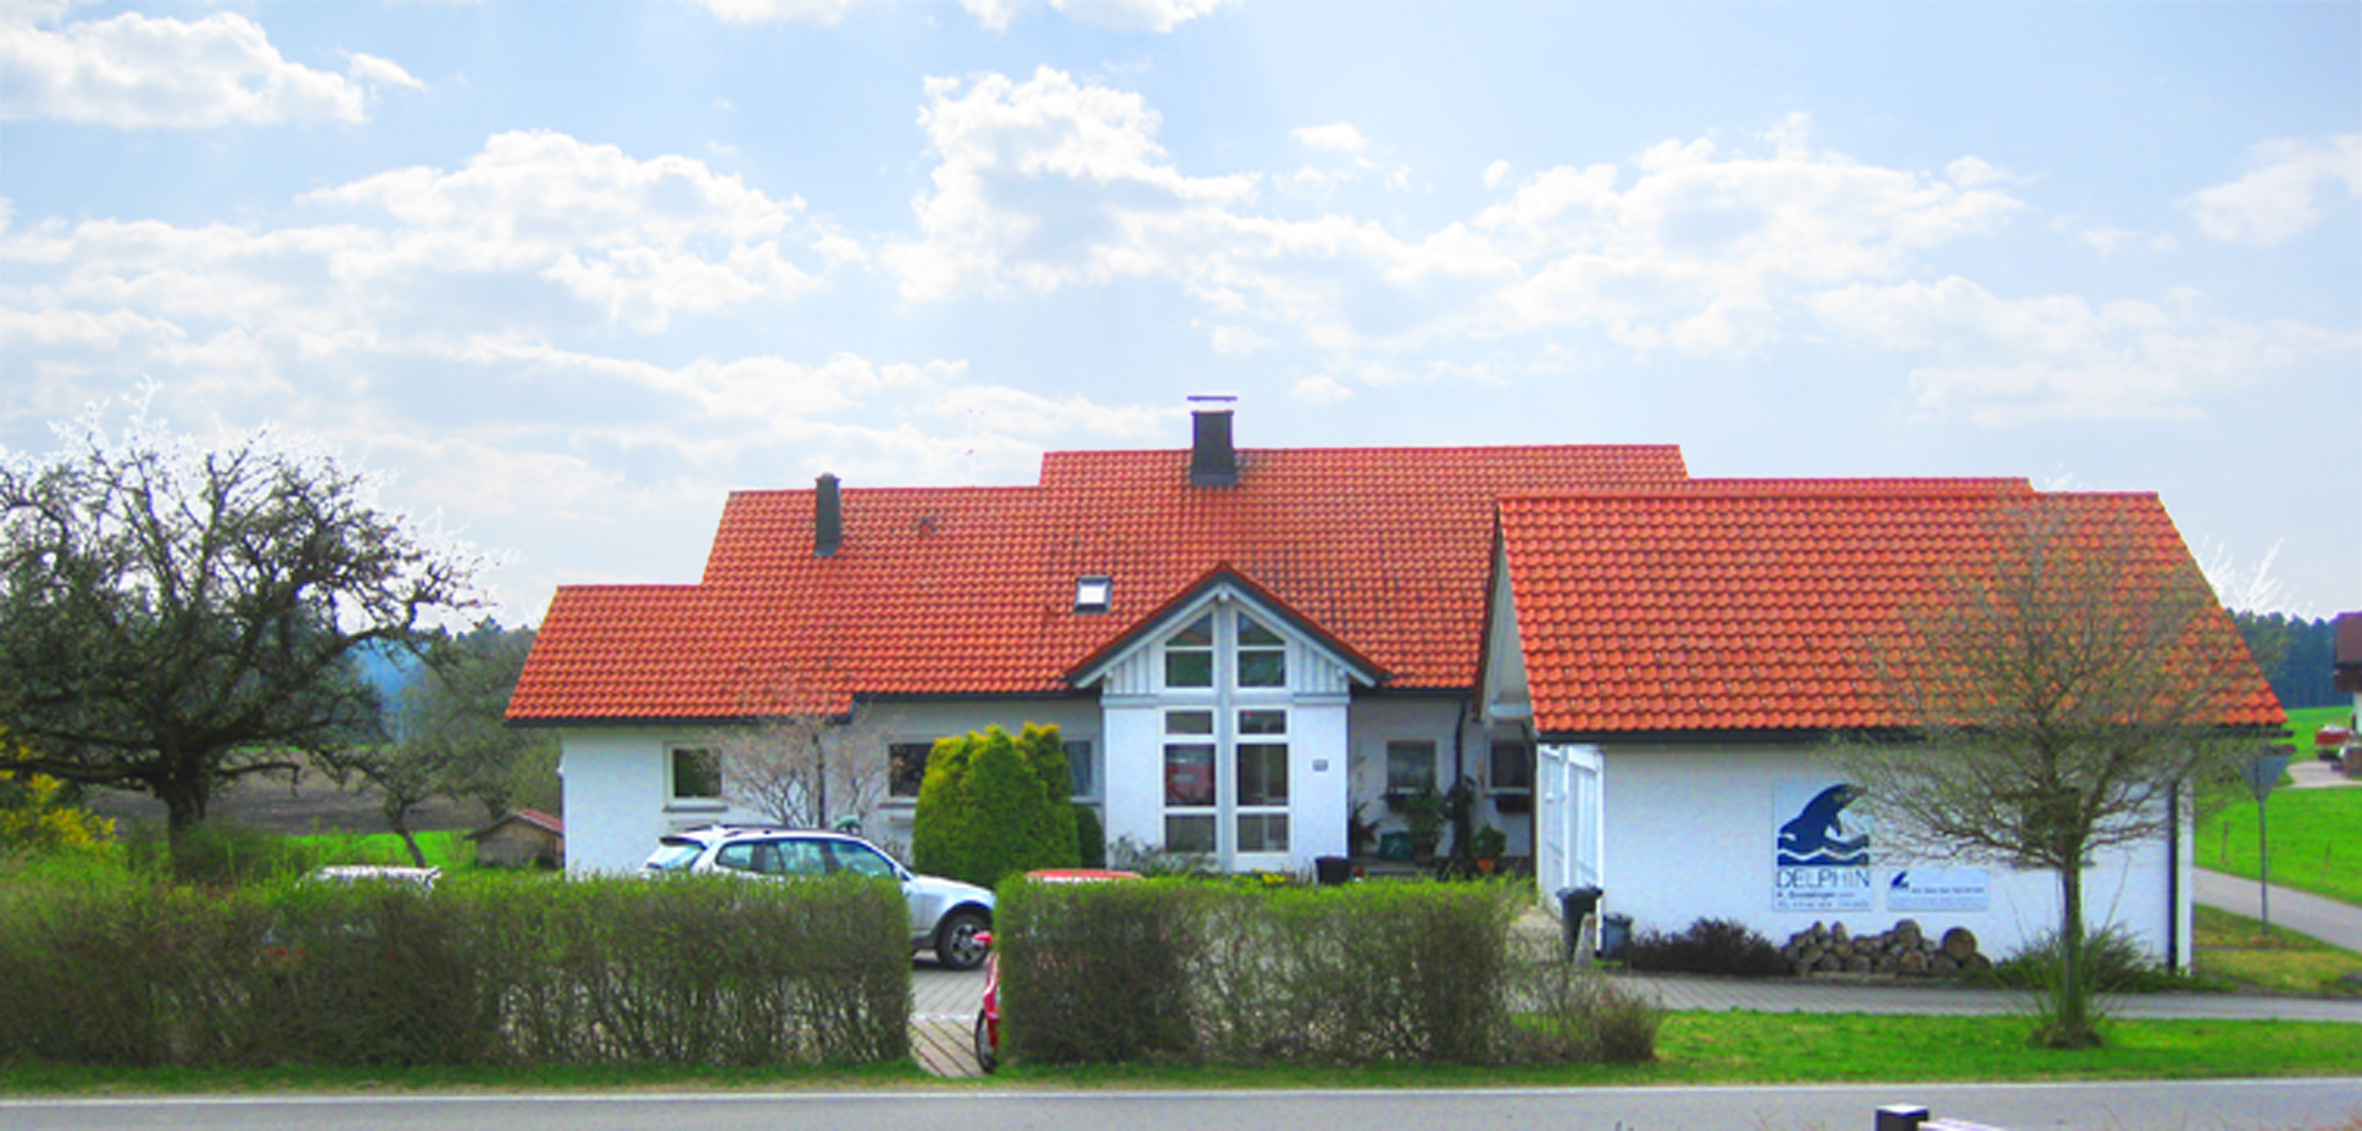 DELPHIN Zentrale H. Grassinger GmbH